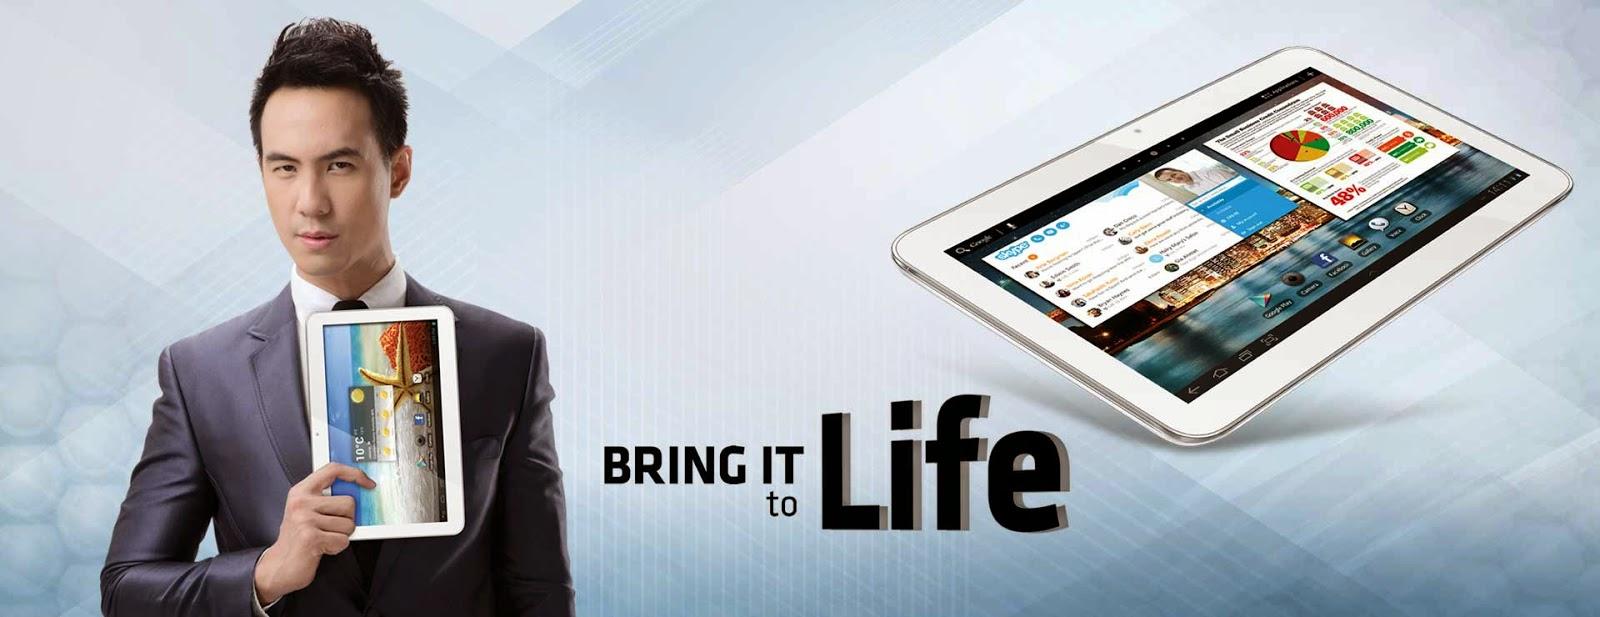 Daftar harga tablet advan bulan agustus 2018 harga tablet advanspesifikasi tablet advan thecheapjerseys Images